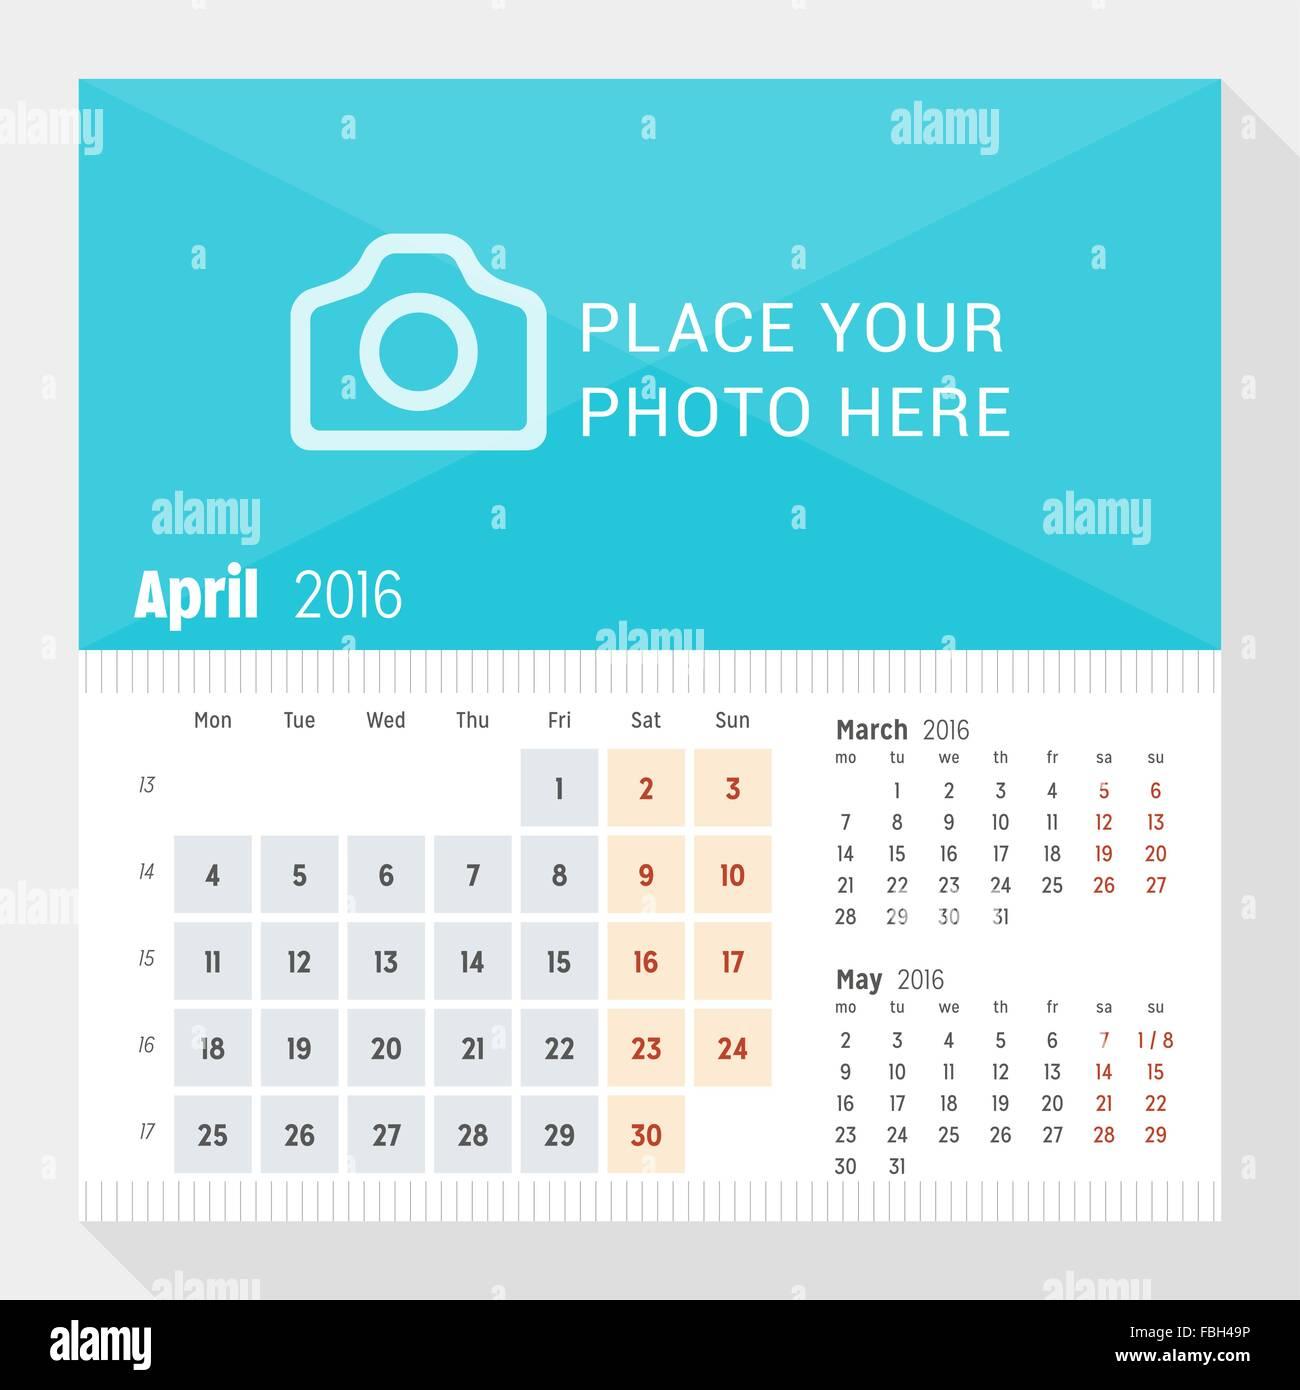 april 2016 desk calendar for 2016 year week starts monday 3